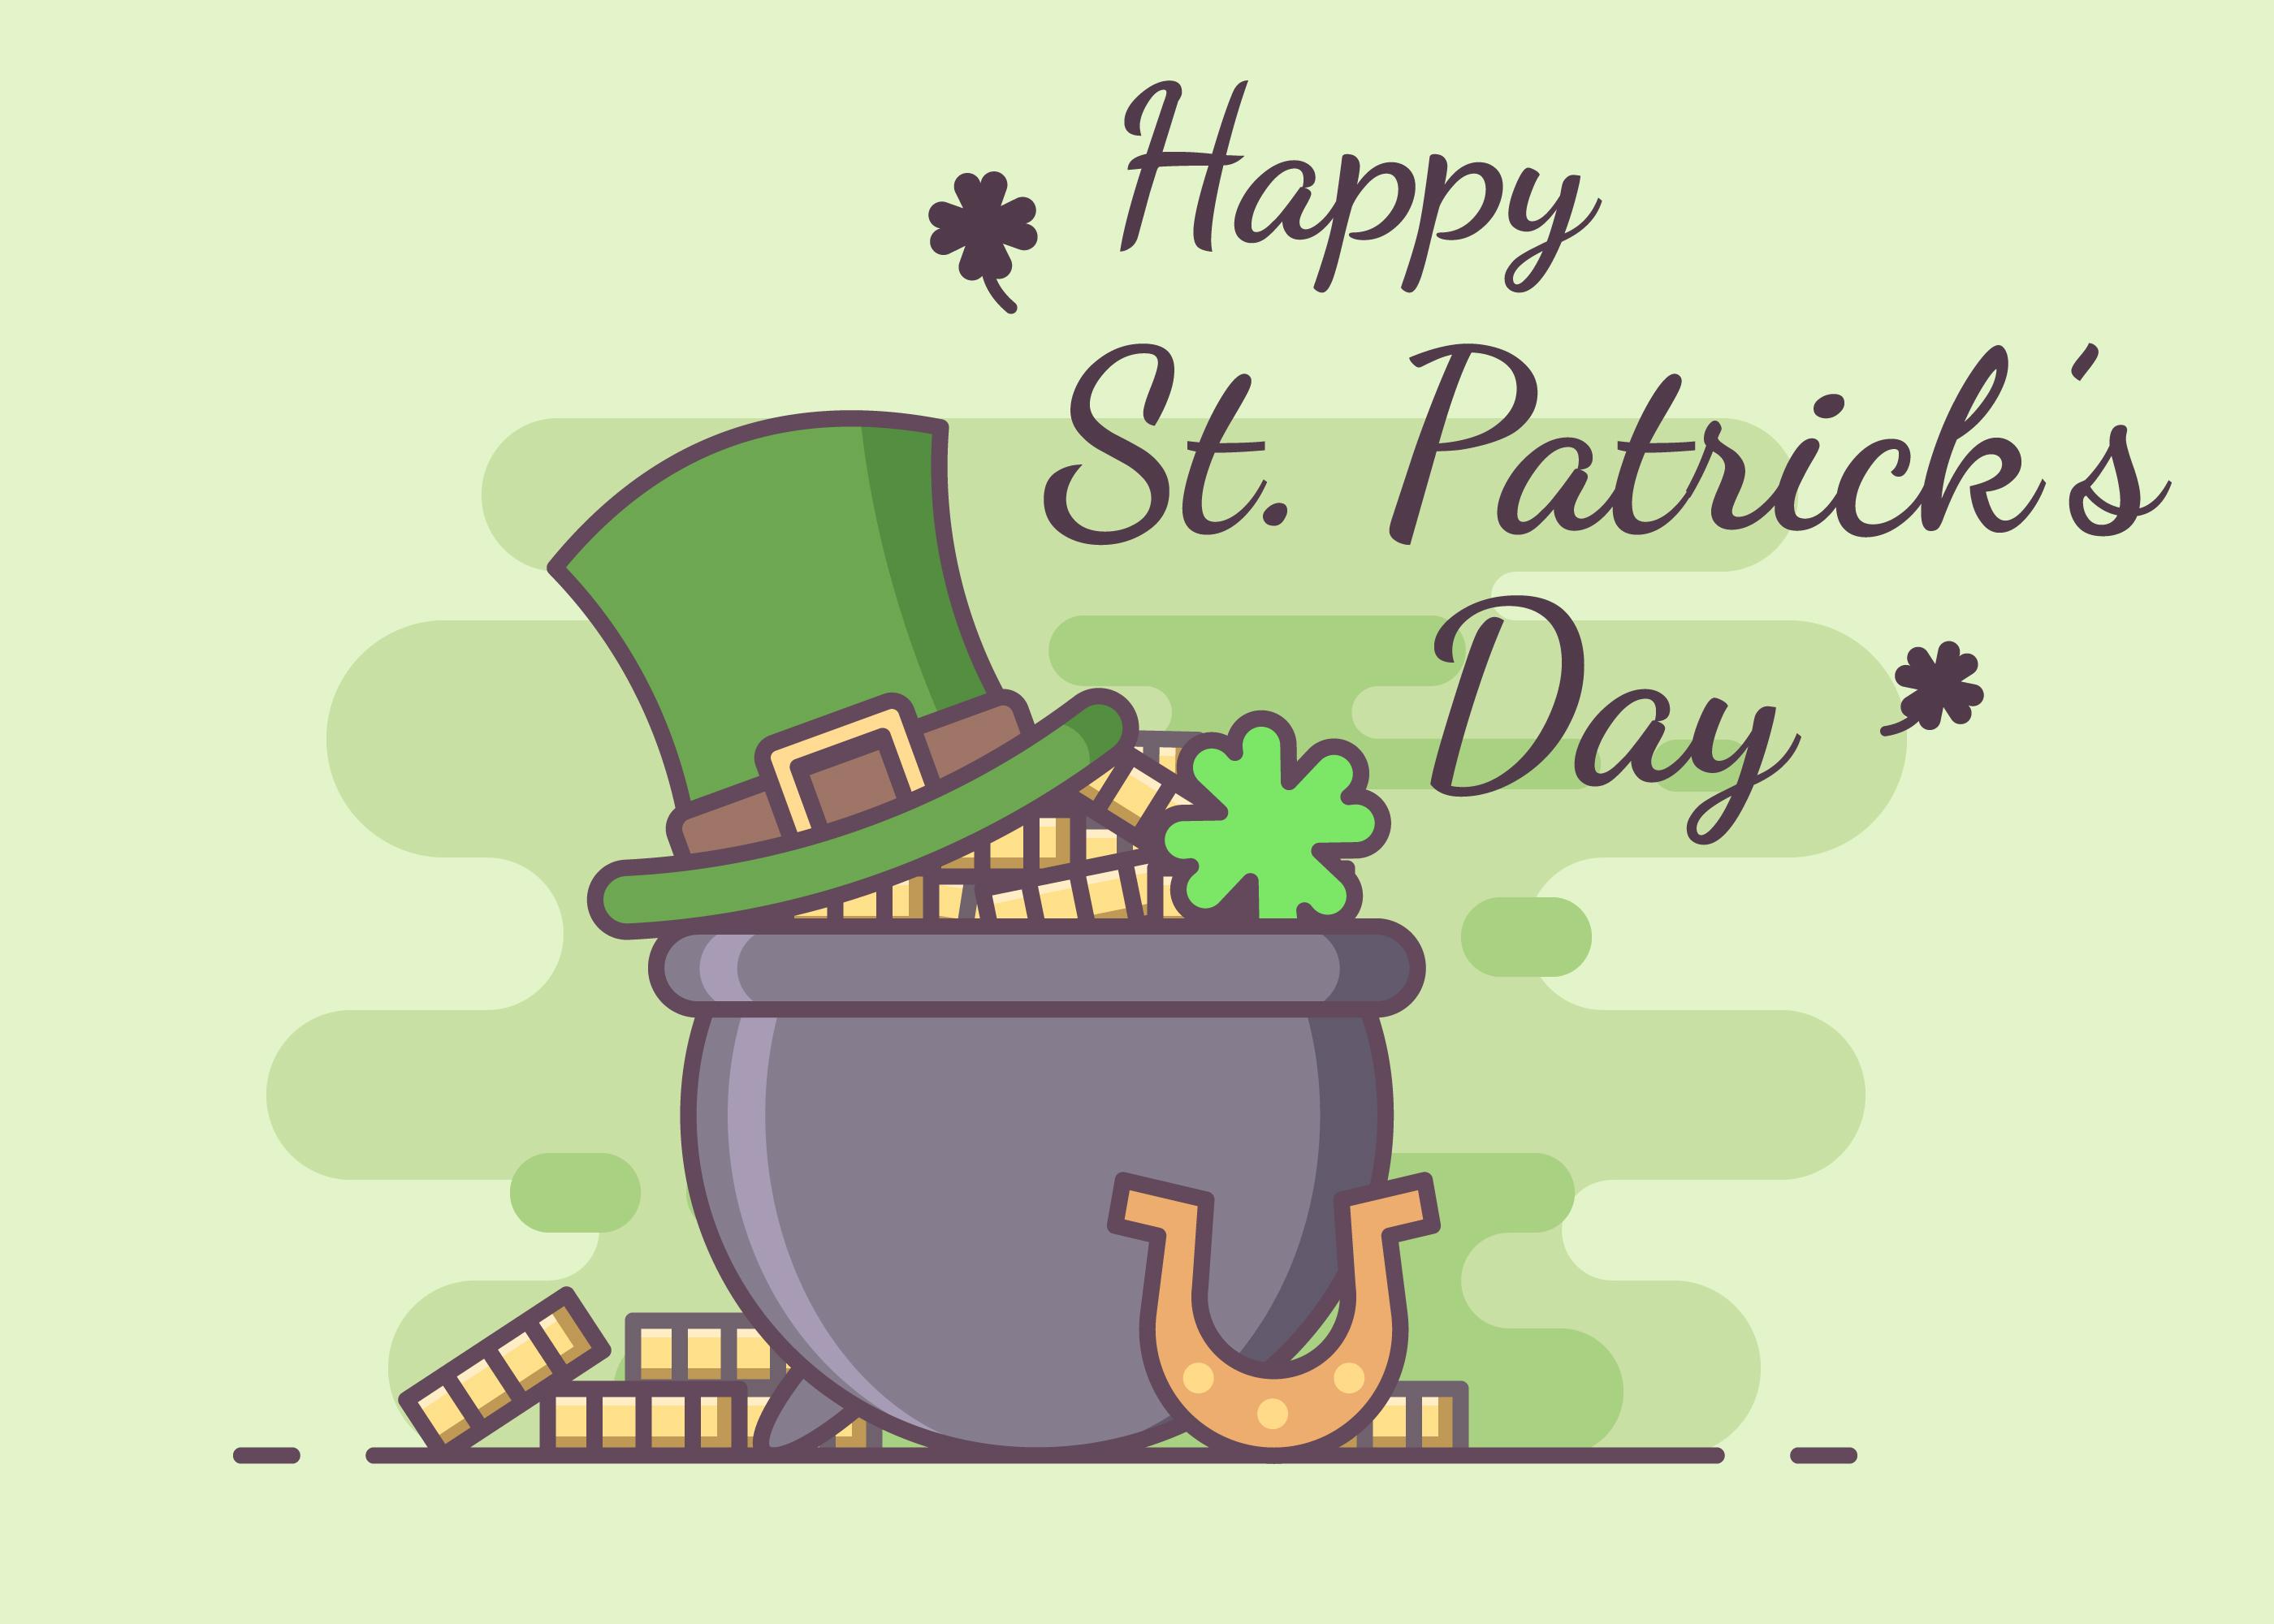 St Patricks Day Greeting Celebration Download Free Vector Art